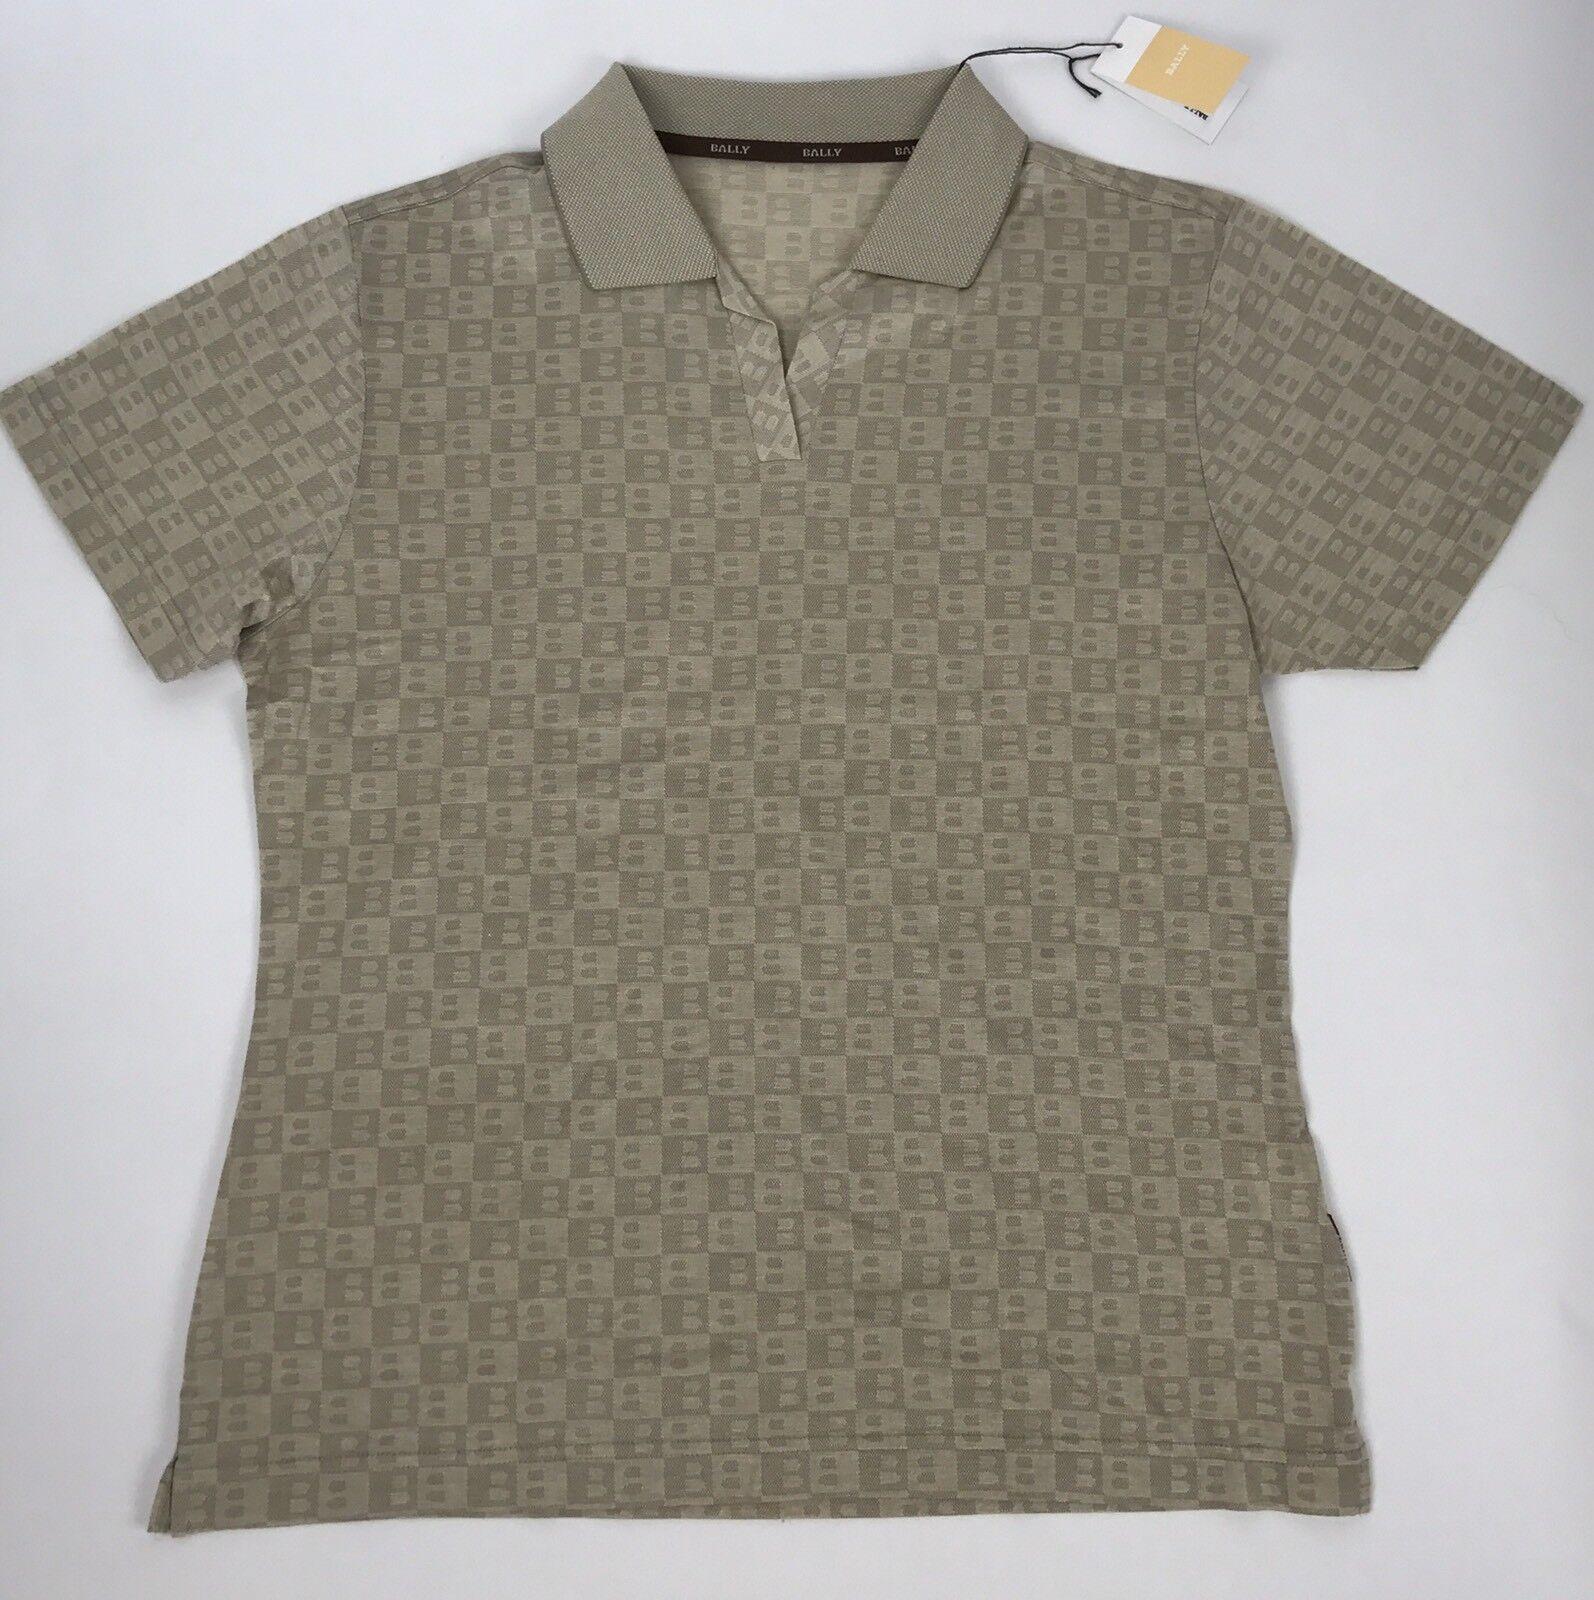 Bally damen's Designer Logo Polo V Neck Short Sleeve Shirt Größe 14-16 New